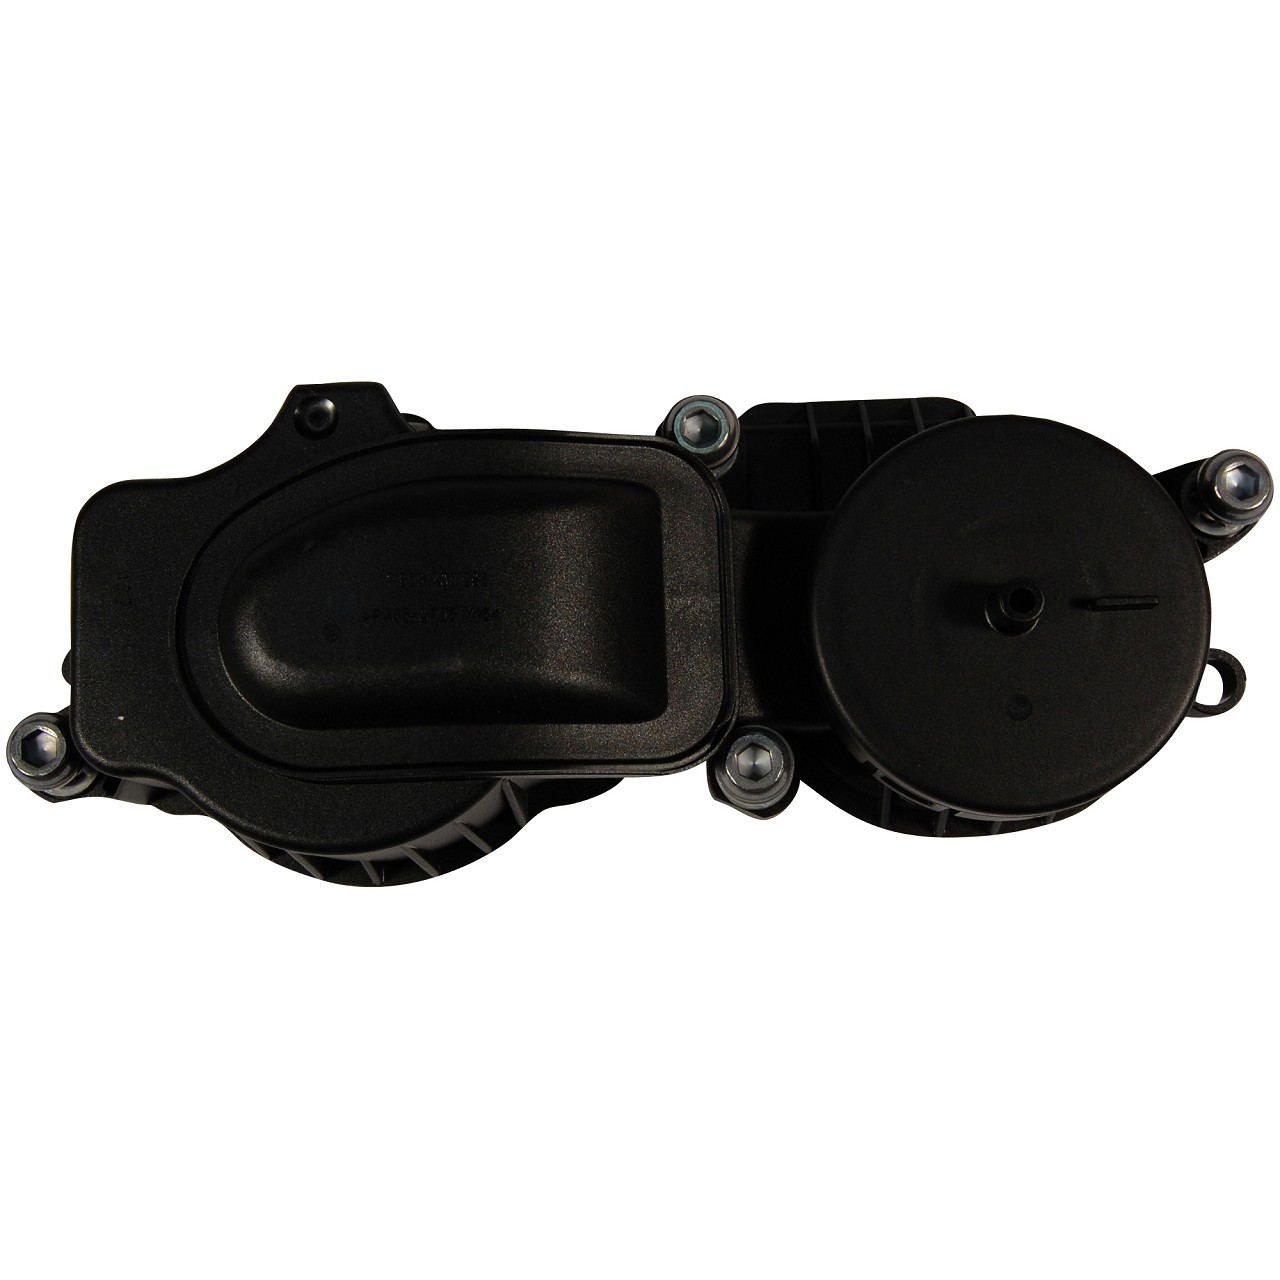 ORIGINAL BMW Ölabscheider Entlüftungseinheit Kurbelgehäuseentlüftung 11127799225